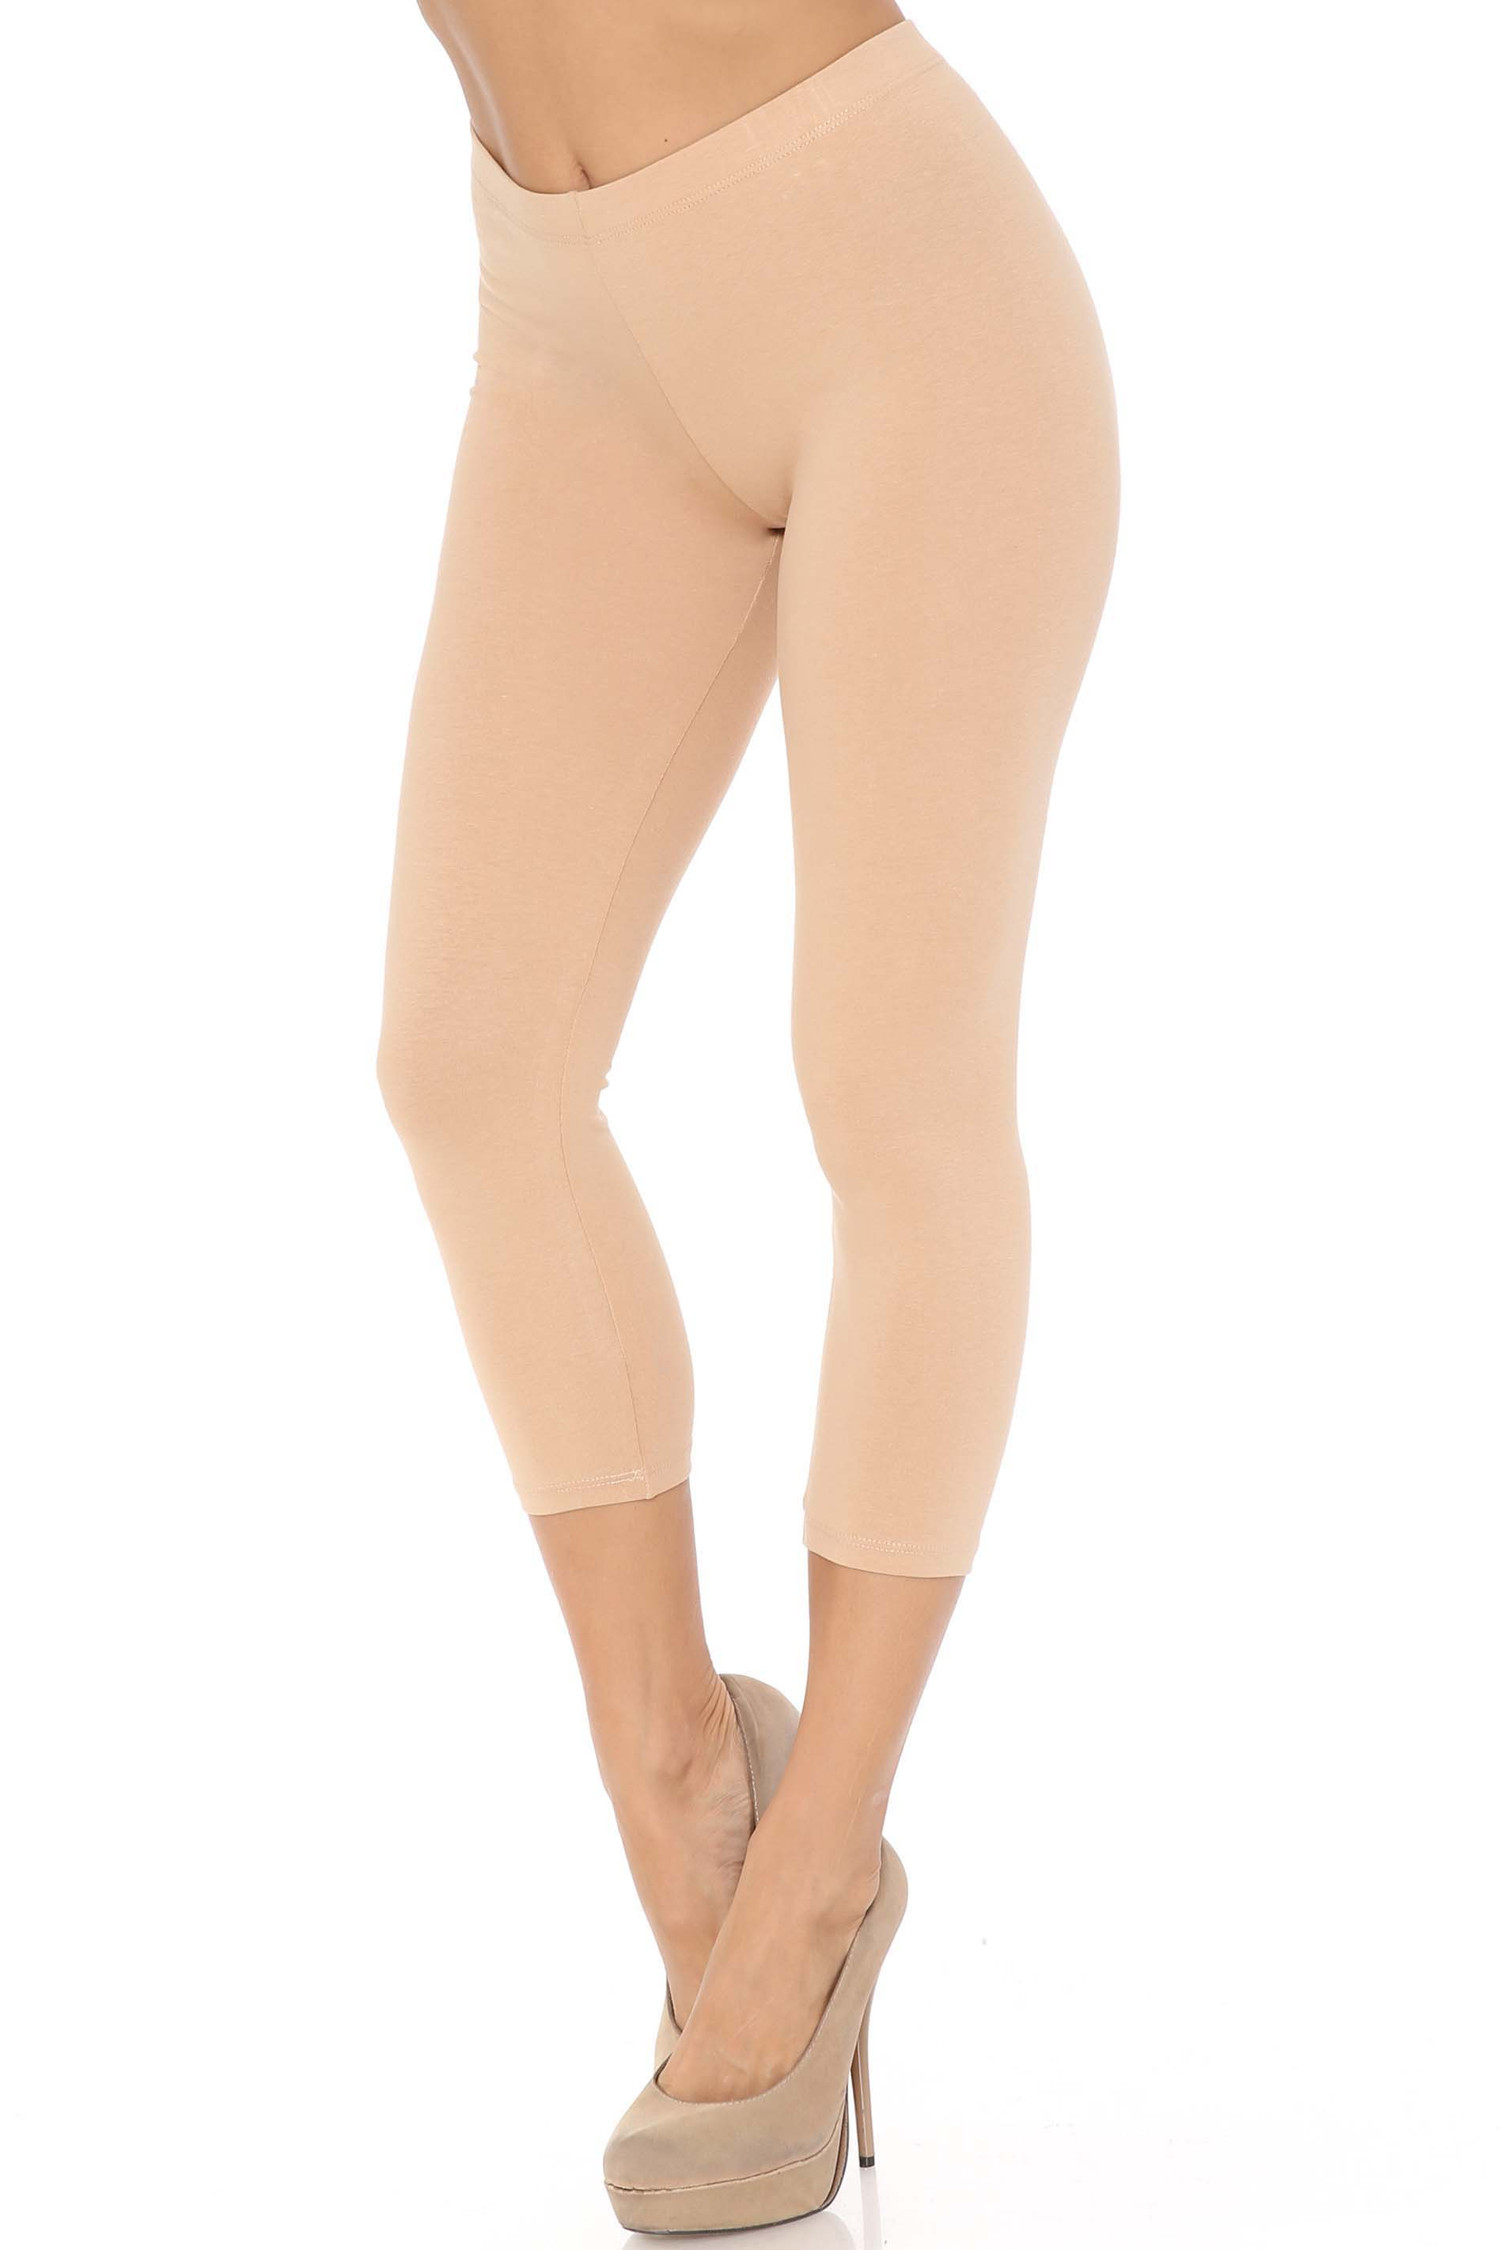 45 degree angle of beige USA Cotton Capri Length Leggings